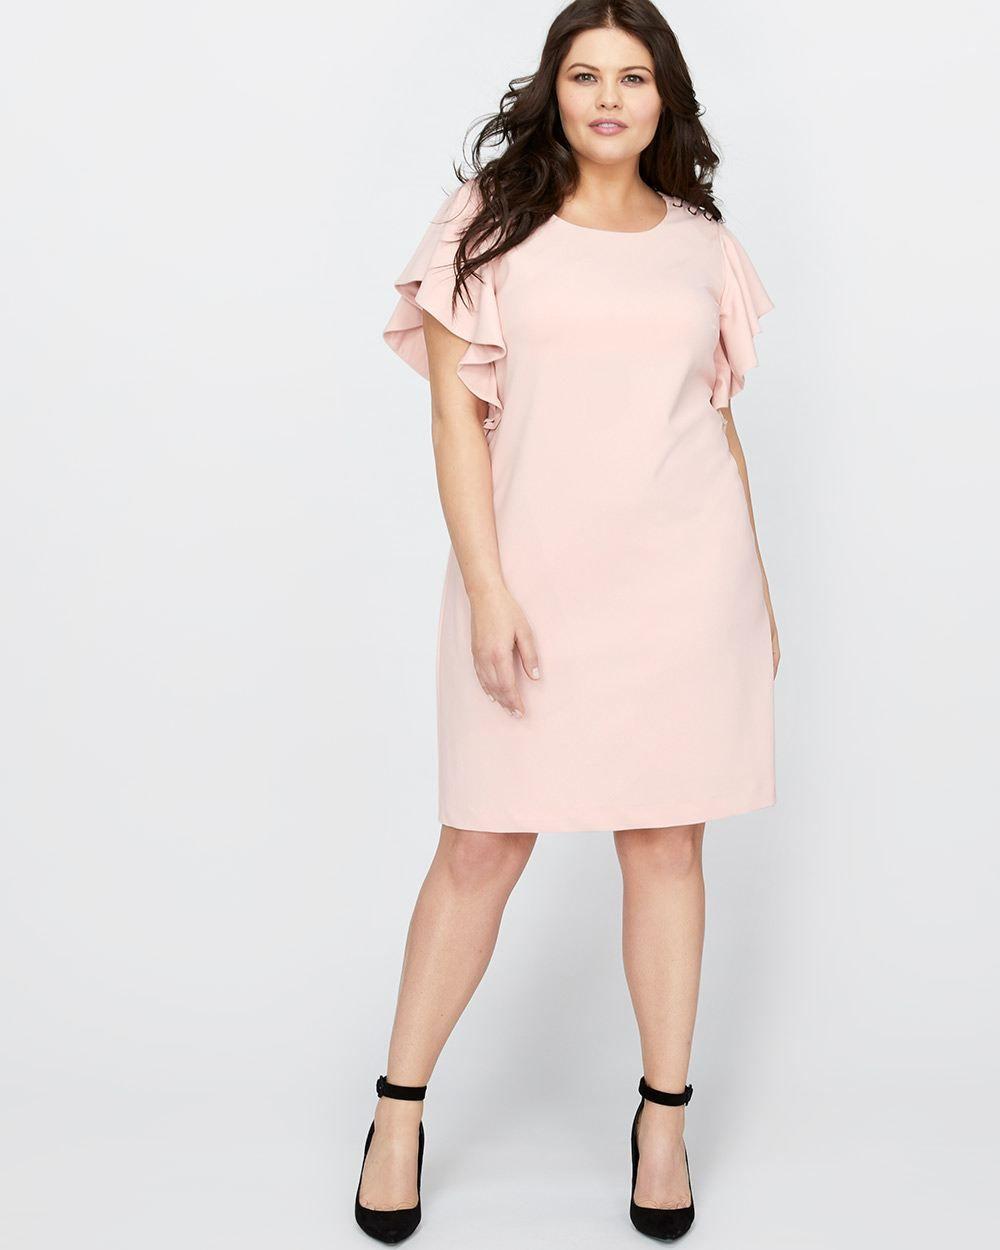 Straight Cut Plus Size Dresses